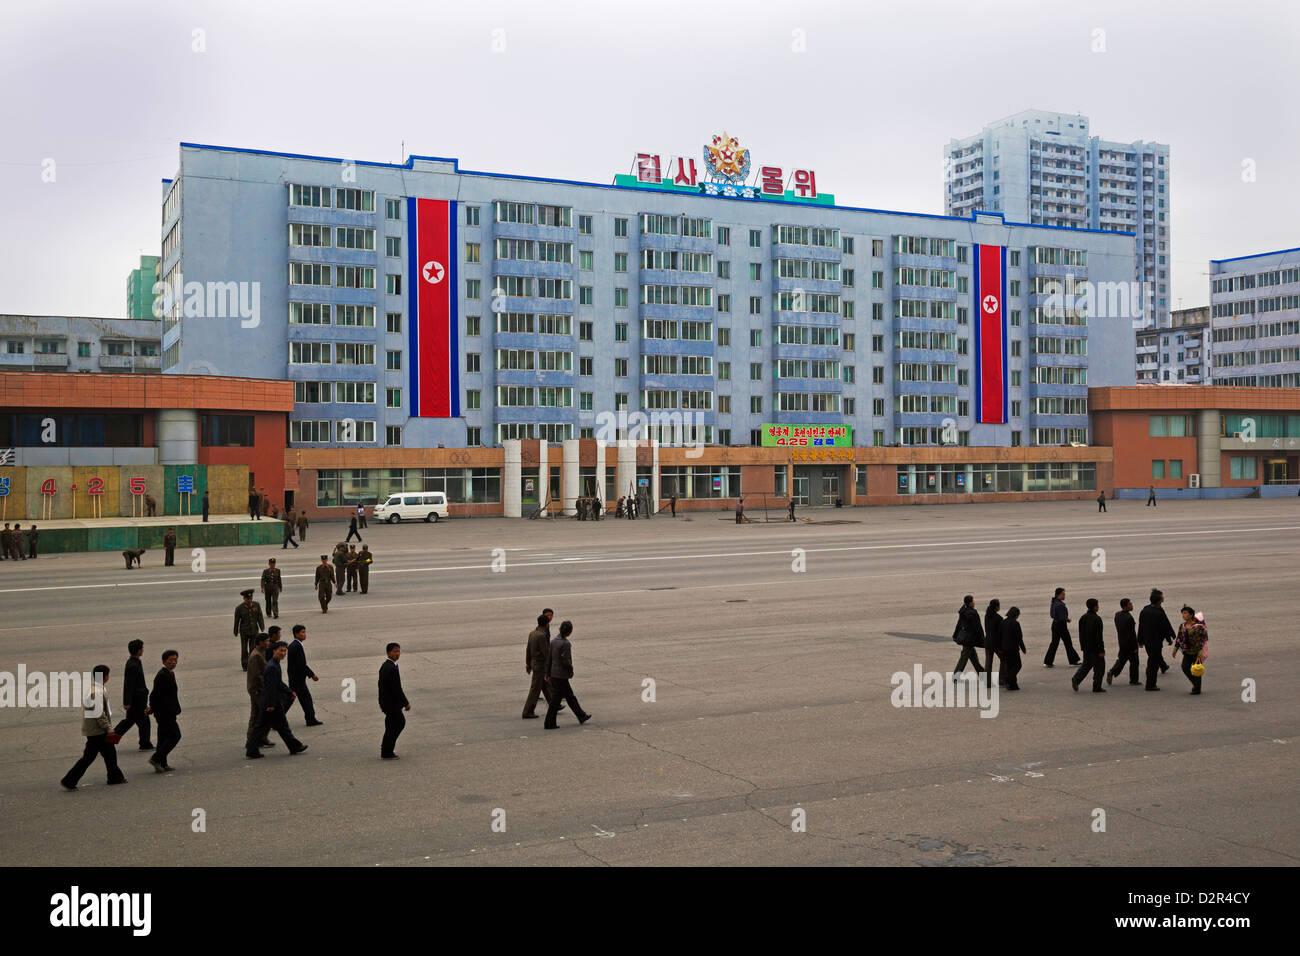 Typical city architecture, Pyongyang, Democratic People's Republic of Korea (DPRK), North Korea, Asia - Stock Image